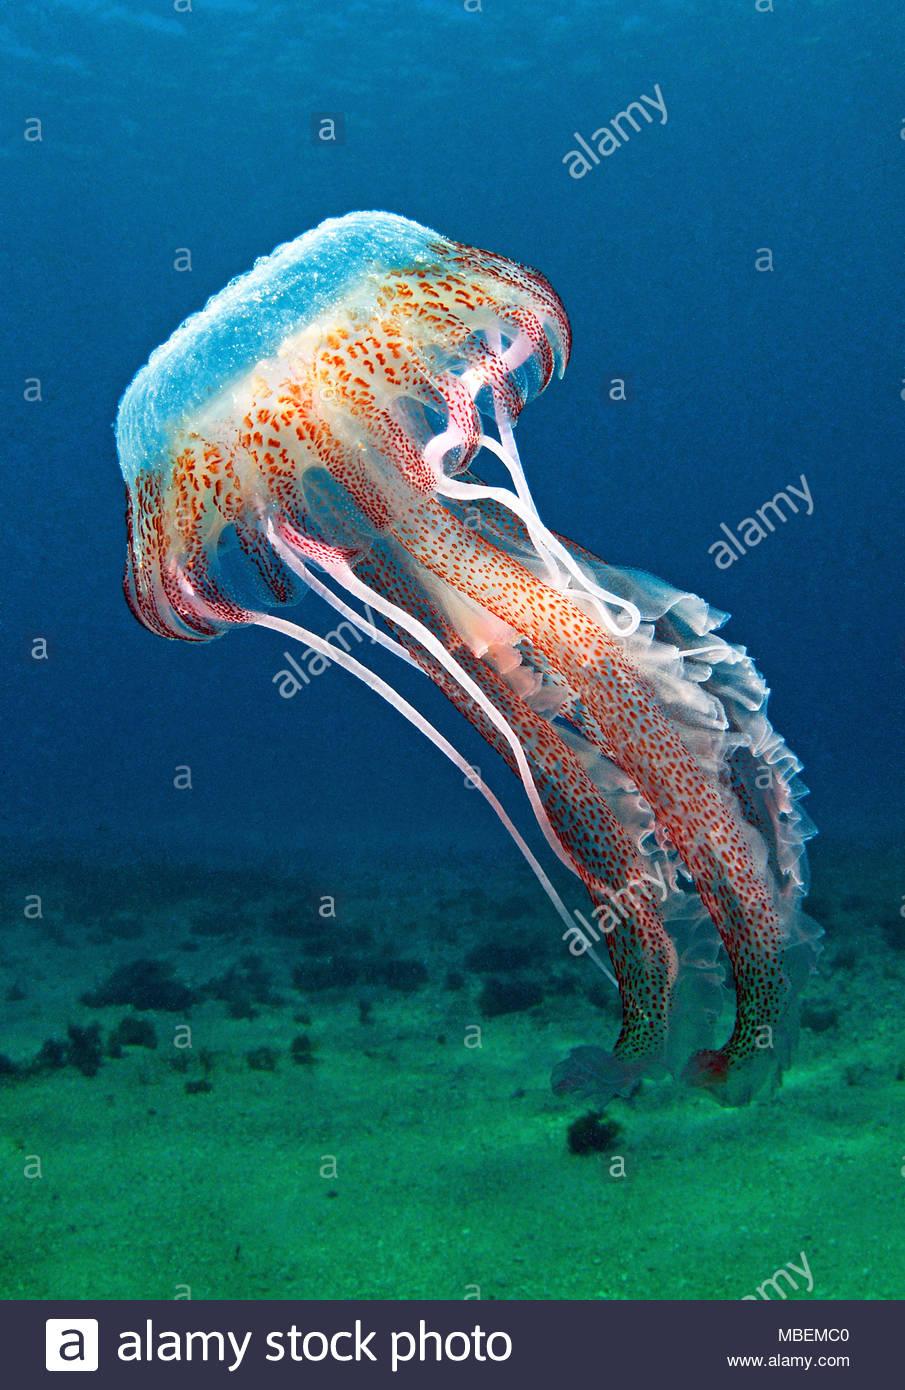 Fire jellyfish, mauve stinger, warty jelly (Pelagia noctiluca), dangerous, Mallorca island, Baleares, Spain - Stock Image